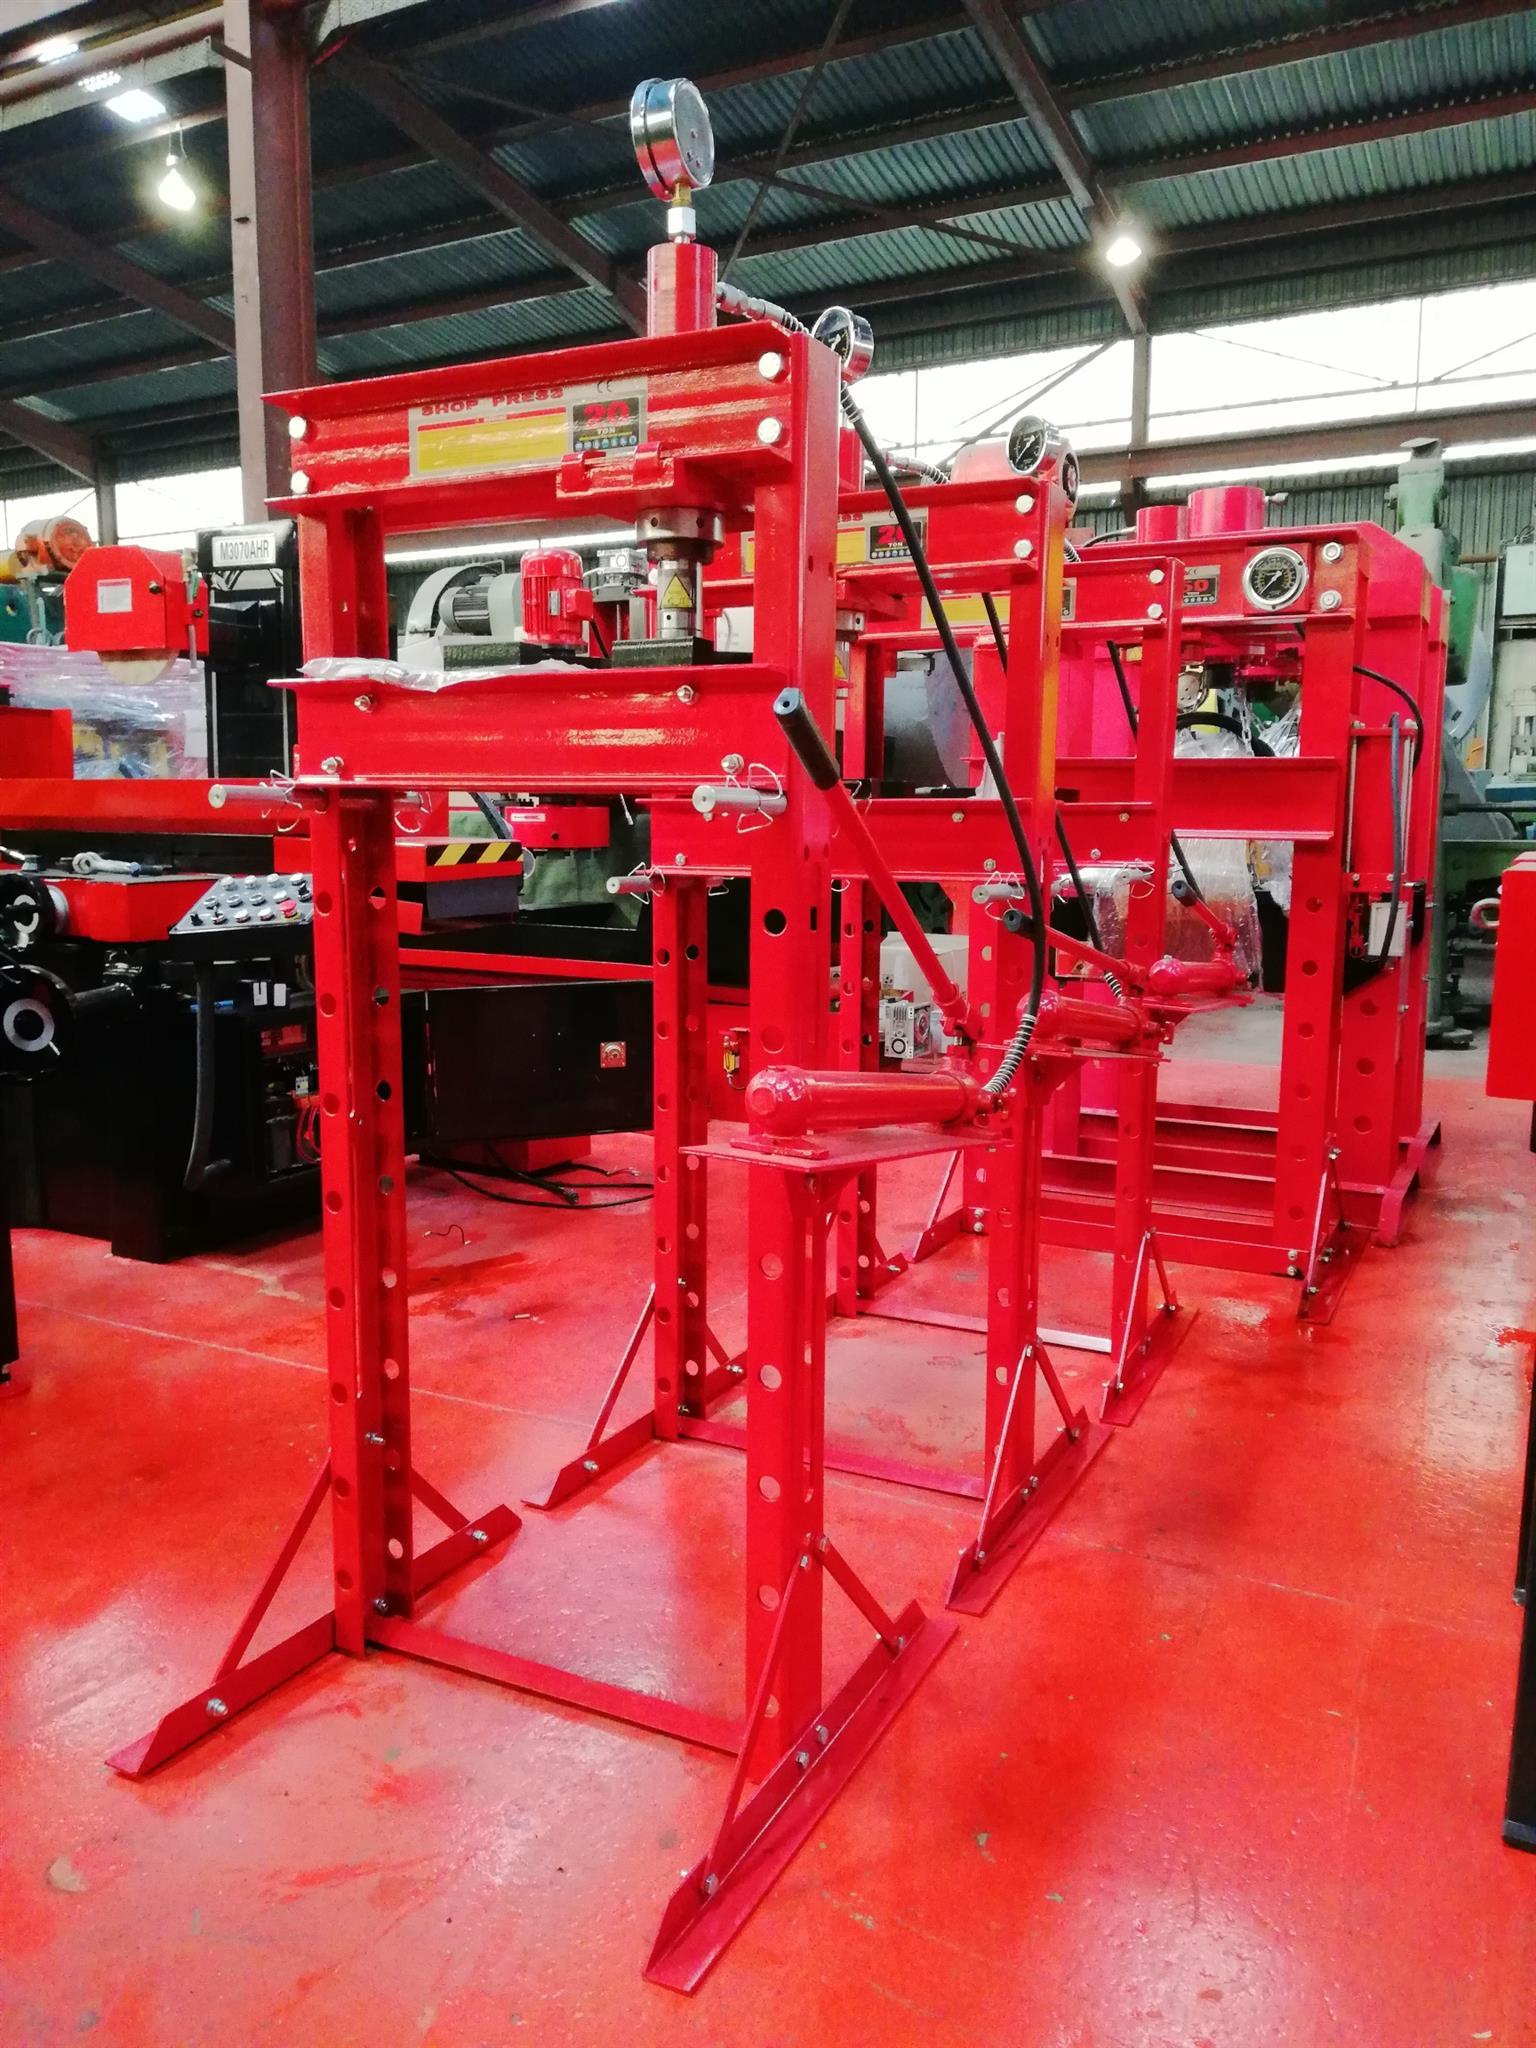 New Hydraulic Shop Press 20 Ton